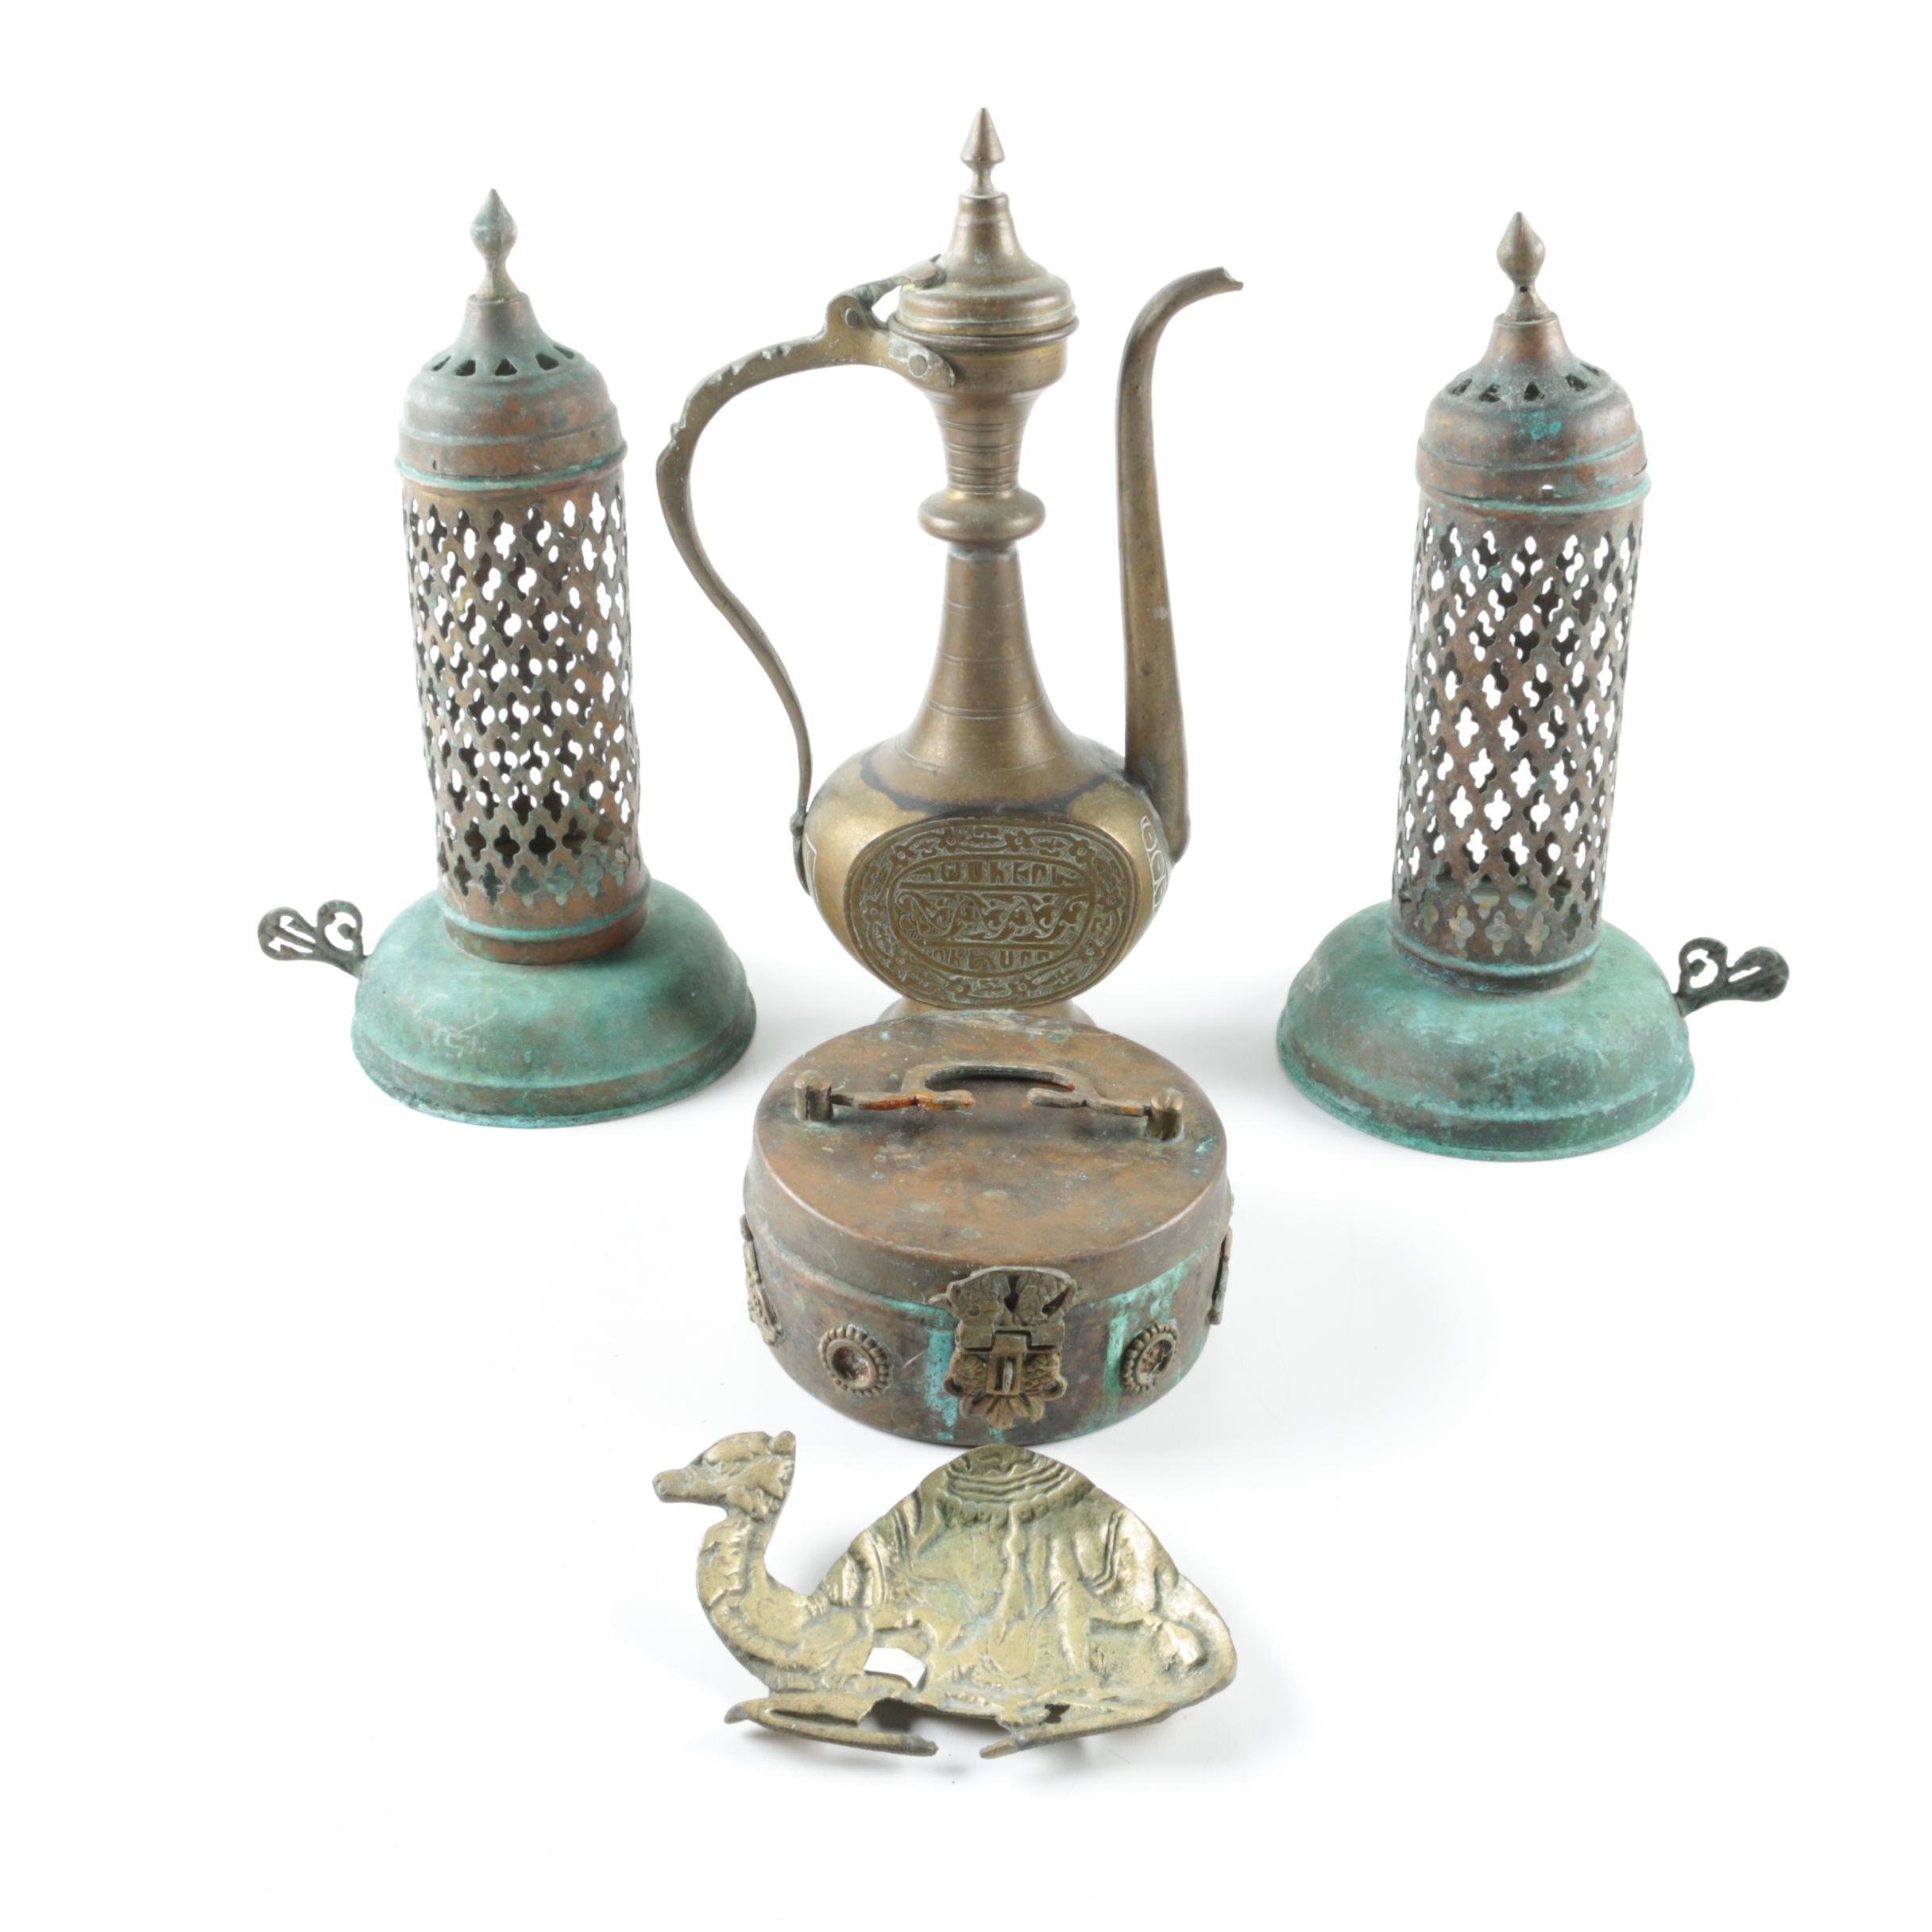 Vintage Middle Eastern Brass Lanterns, Teapot, Trinket Box, and Ash Receiver